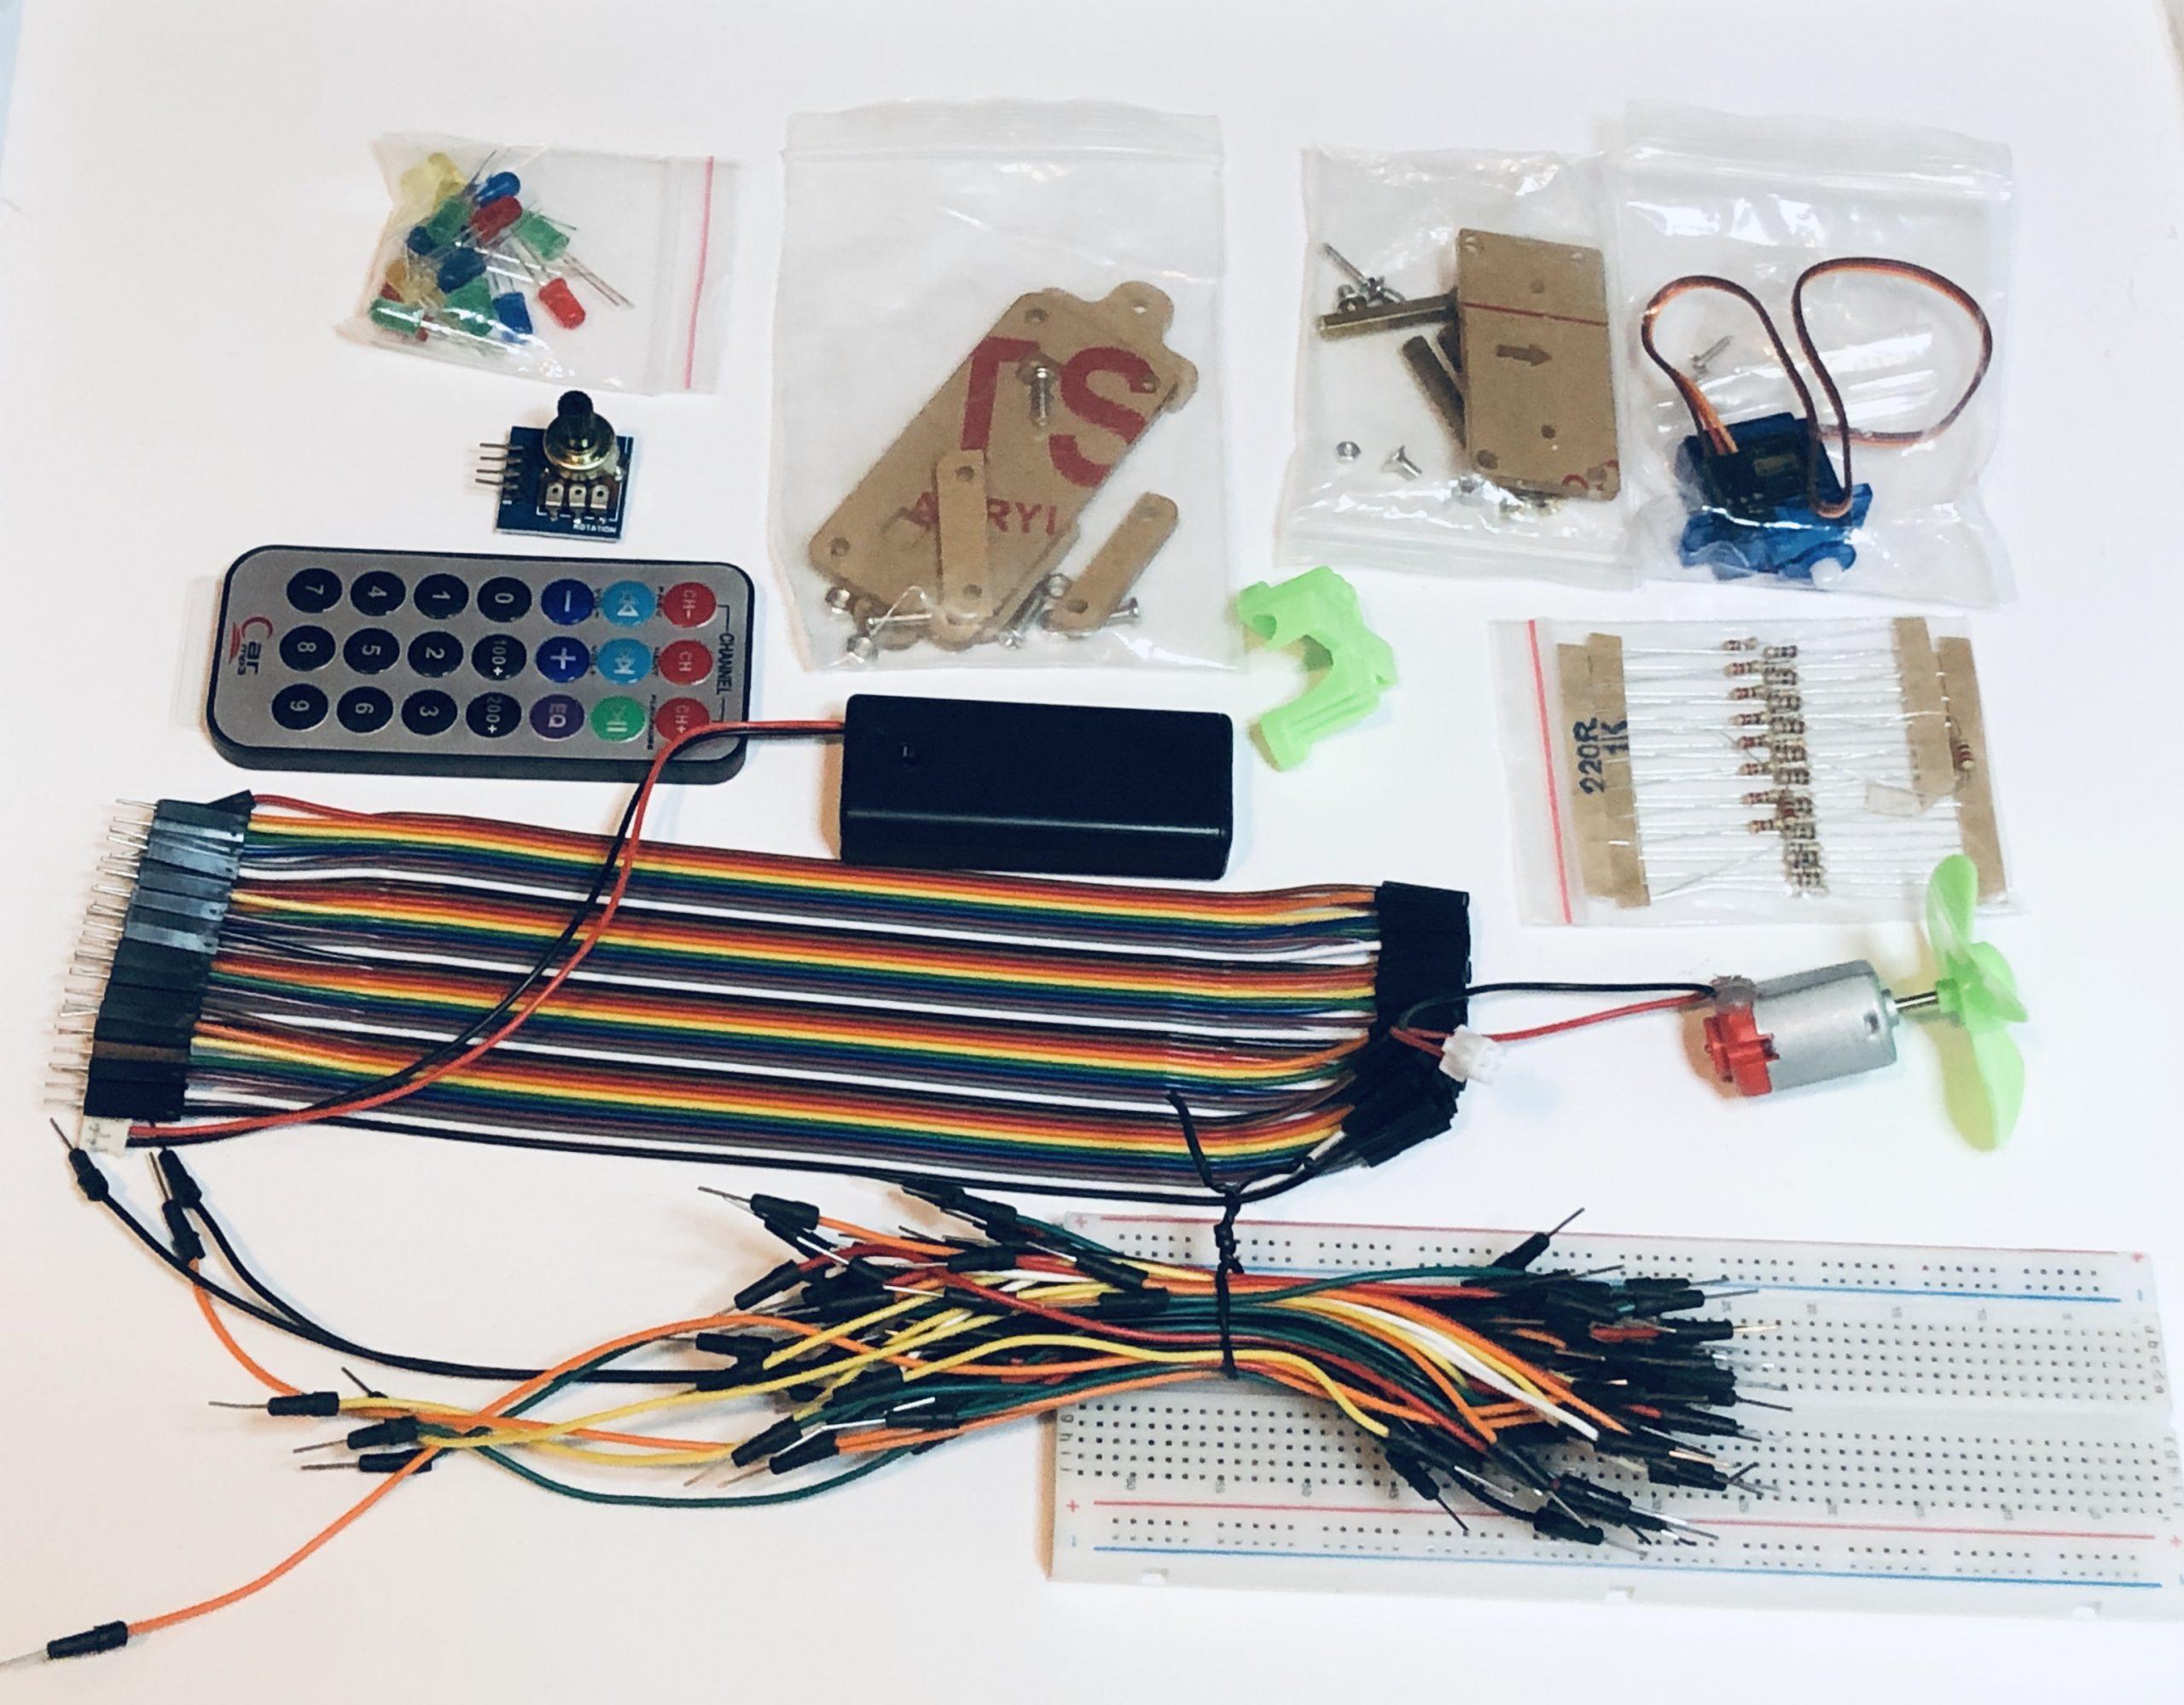 Micro:bit kit contents